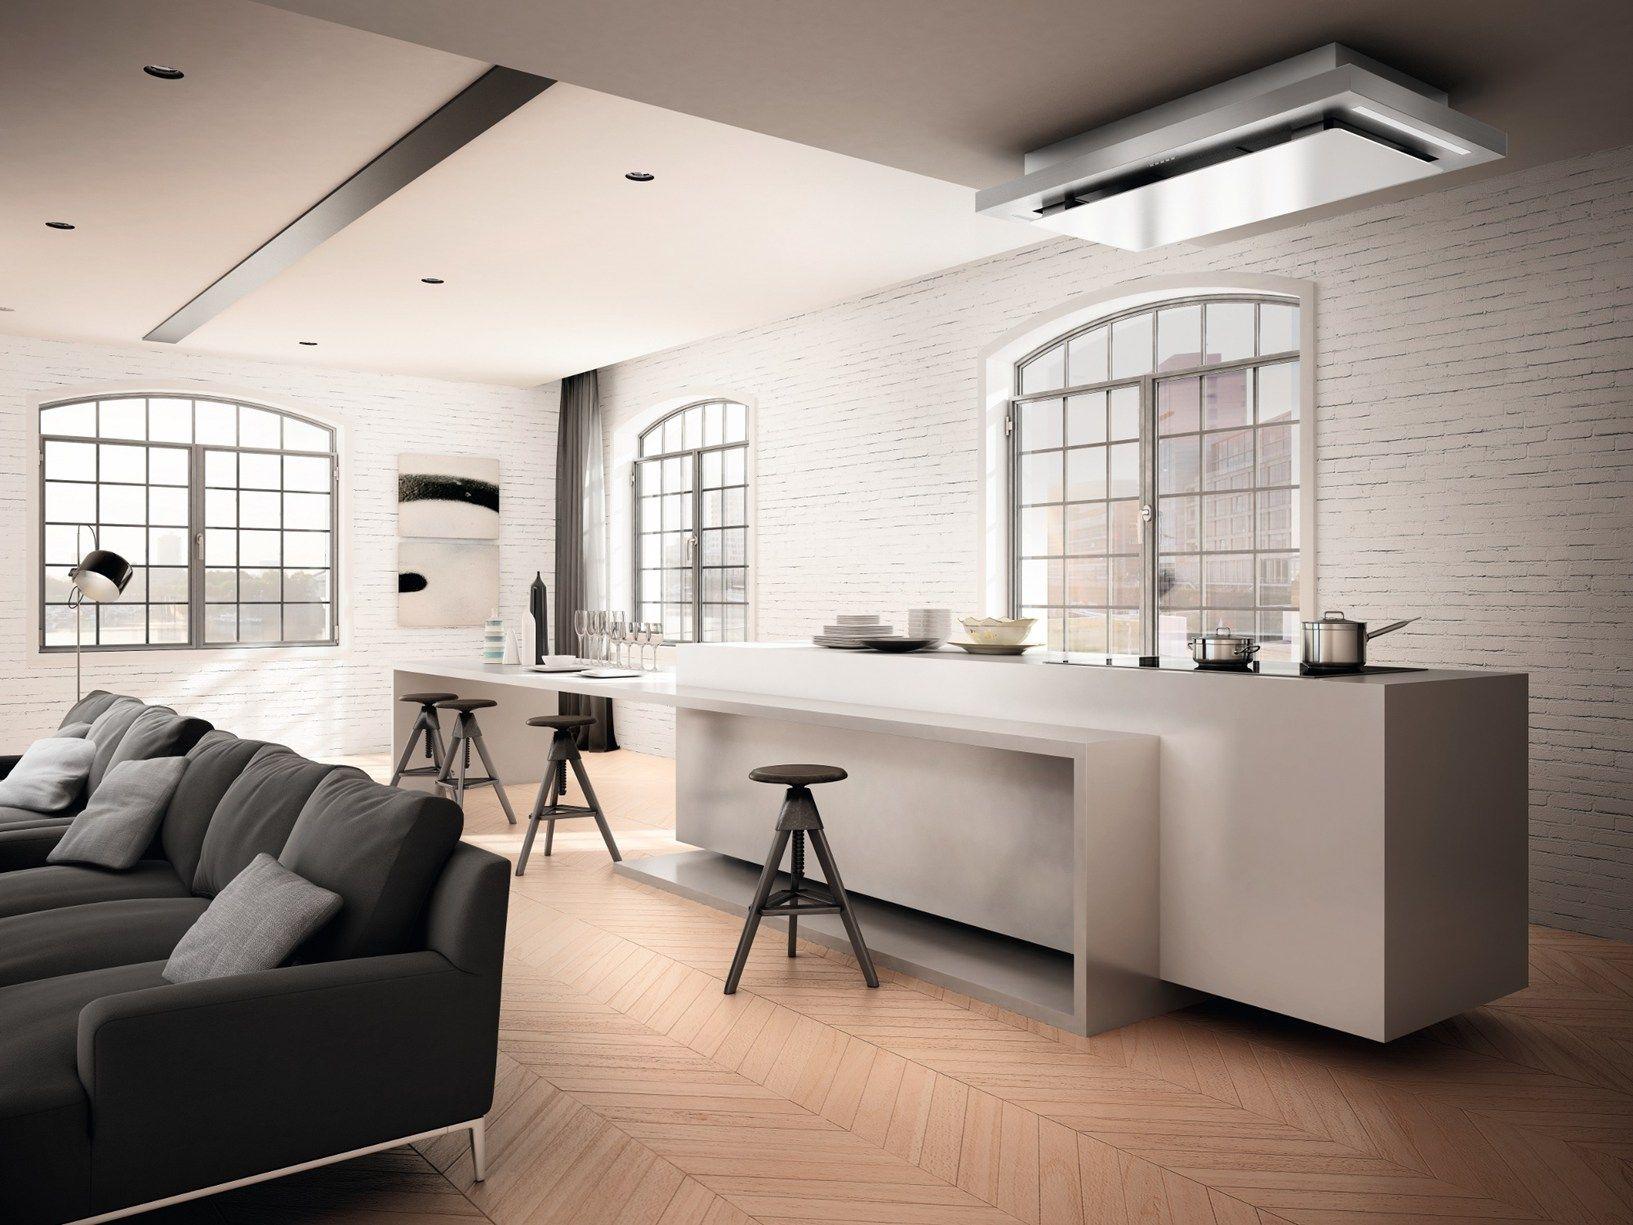 Stunning Cappe Aspiranti Prezzi Photos - Amazing House Design ...